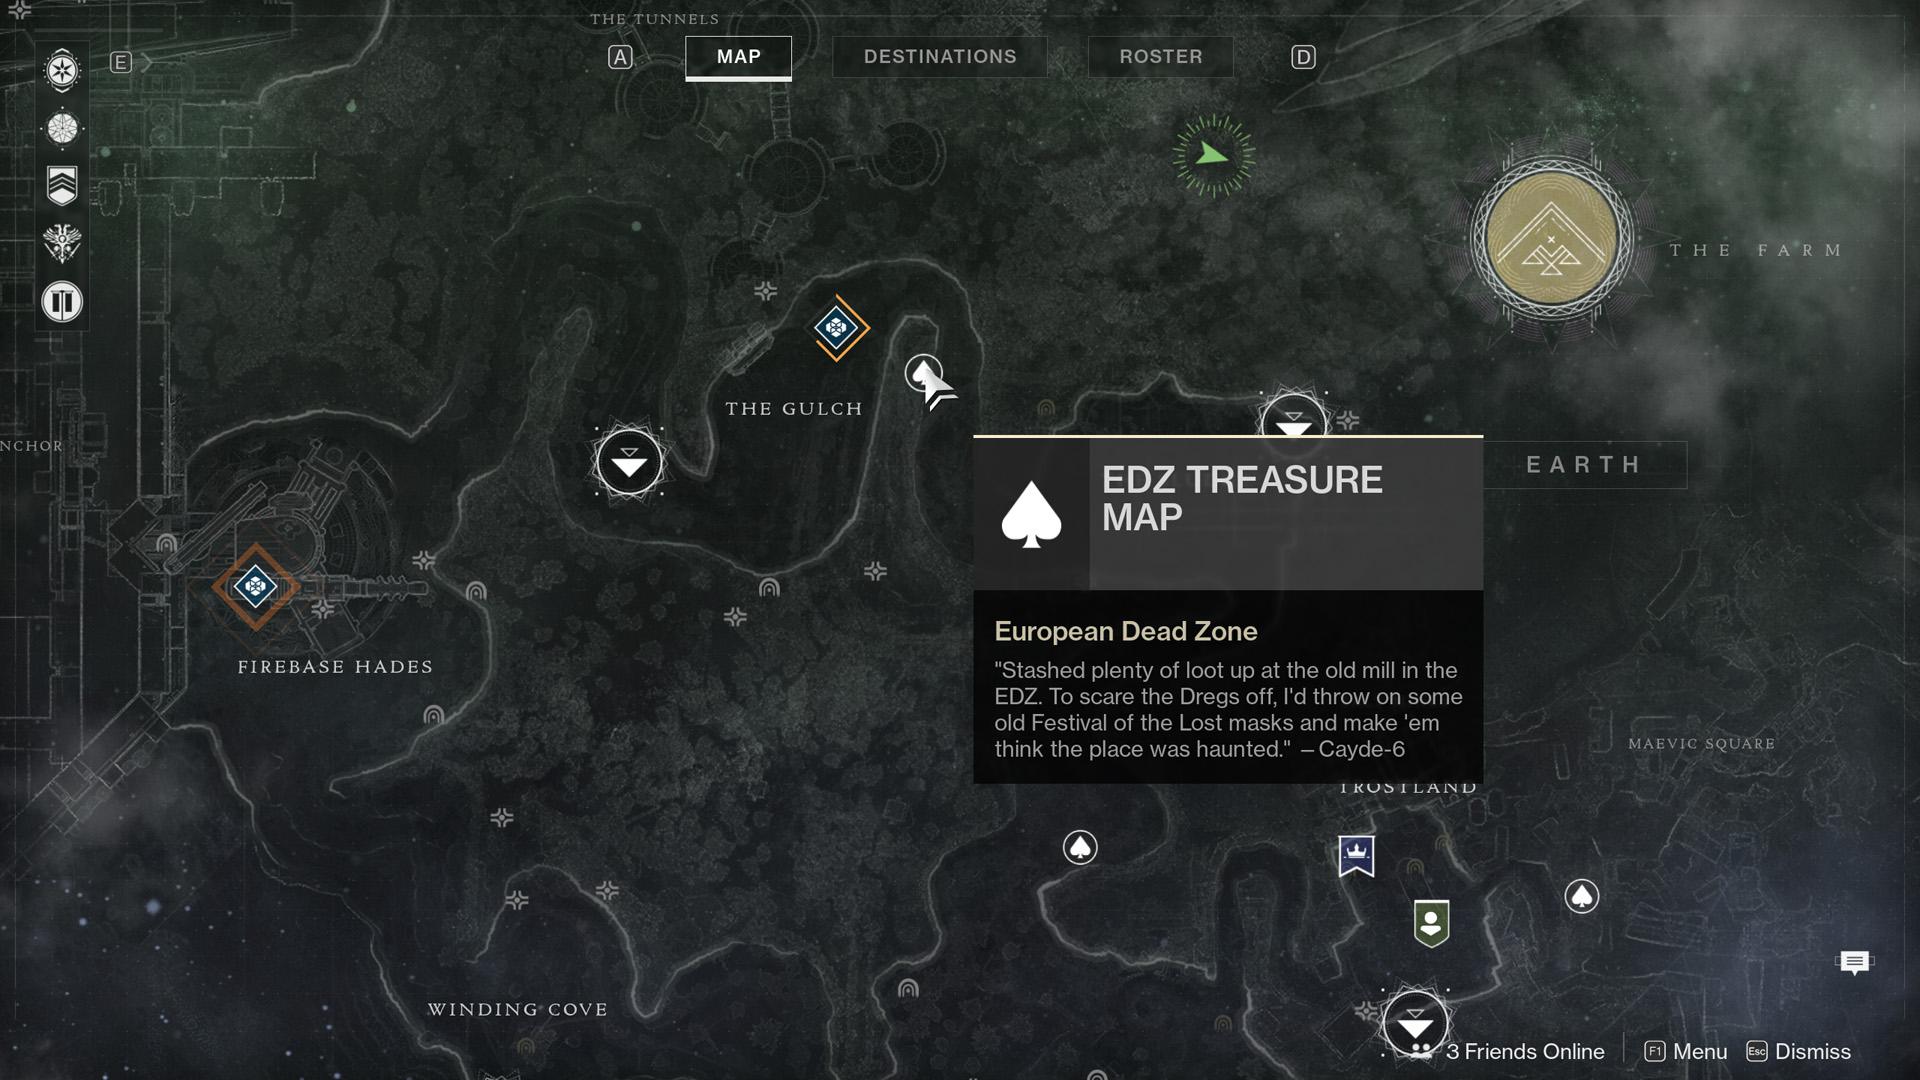 Destiny 2 Cayde 6 Treasure Maps For The Edz On Earth Shacknews